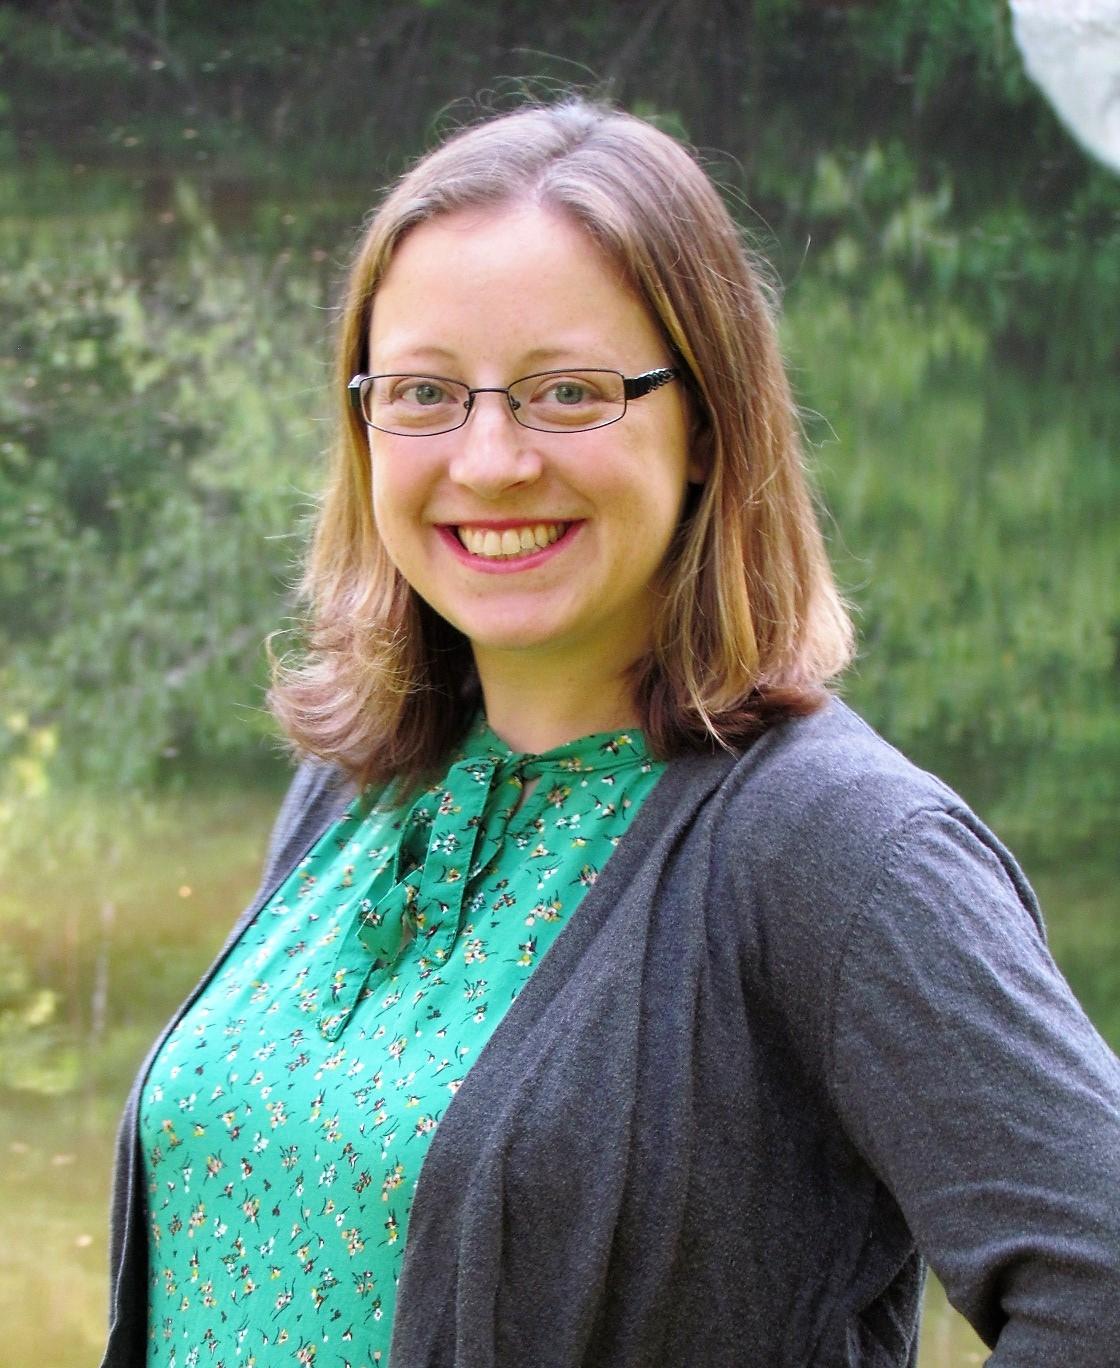 Catherin Weeks, Professional Organizer, The Tidy Organizer, LLC Bedford, NH